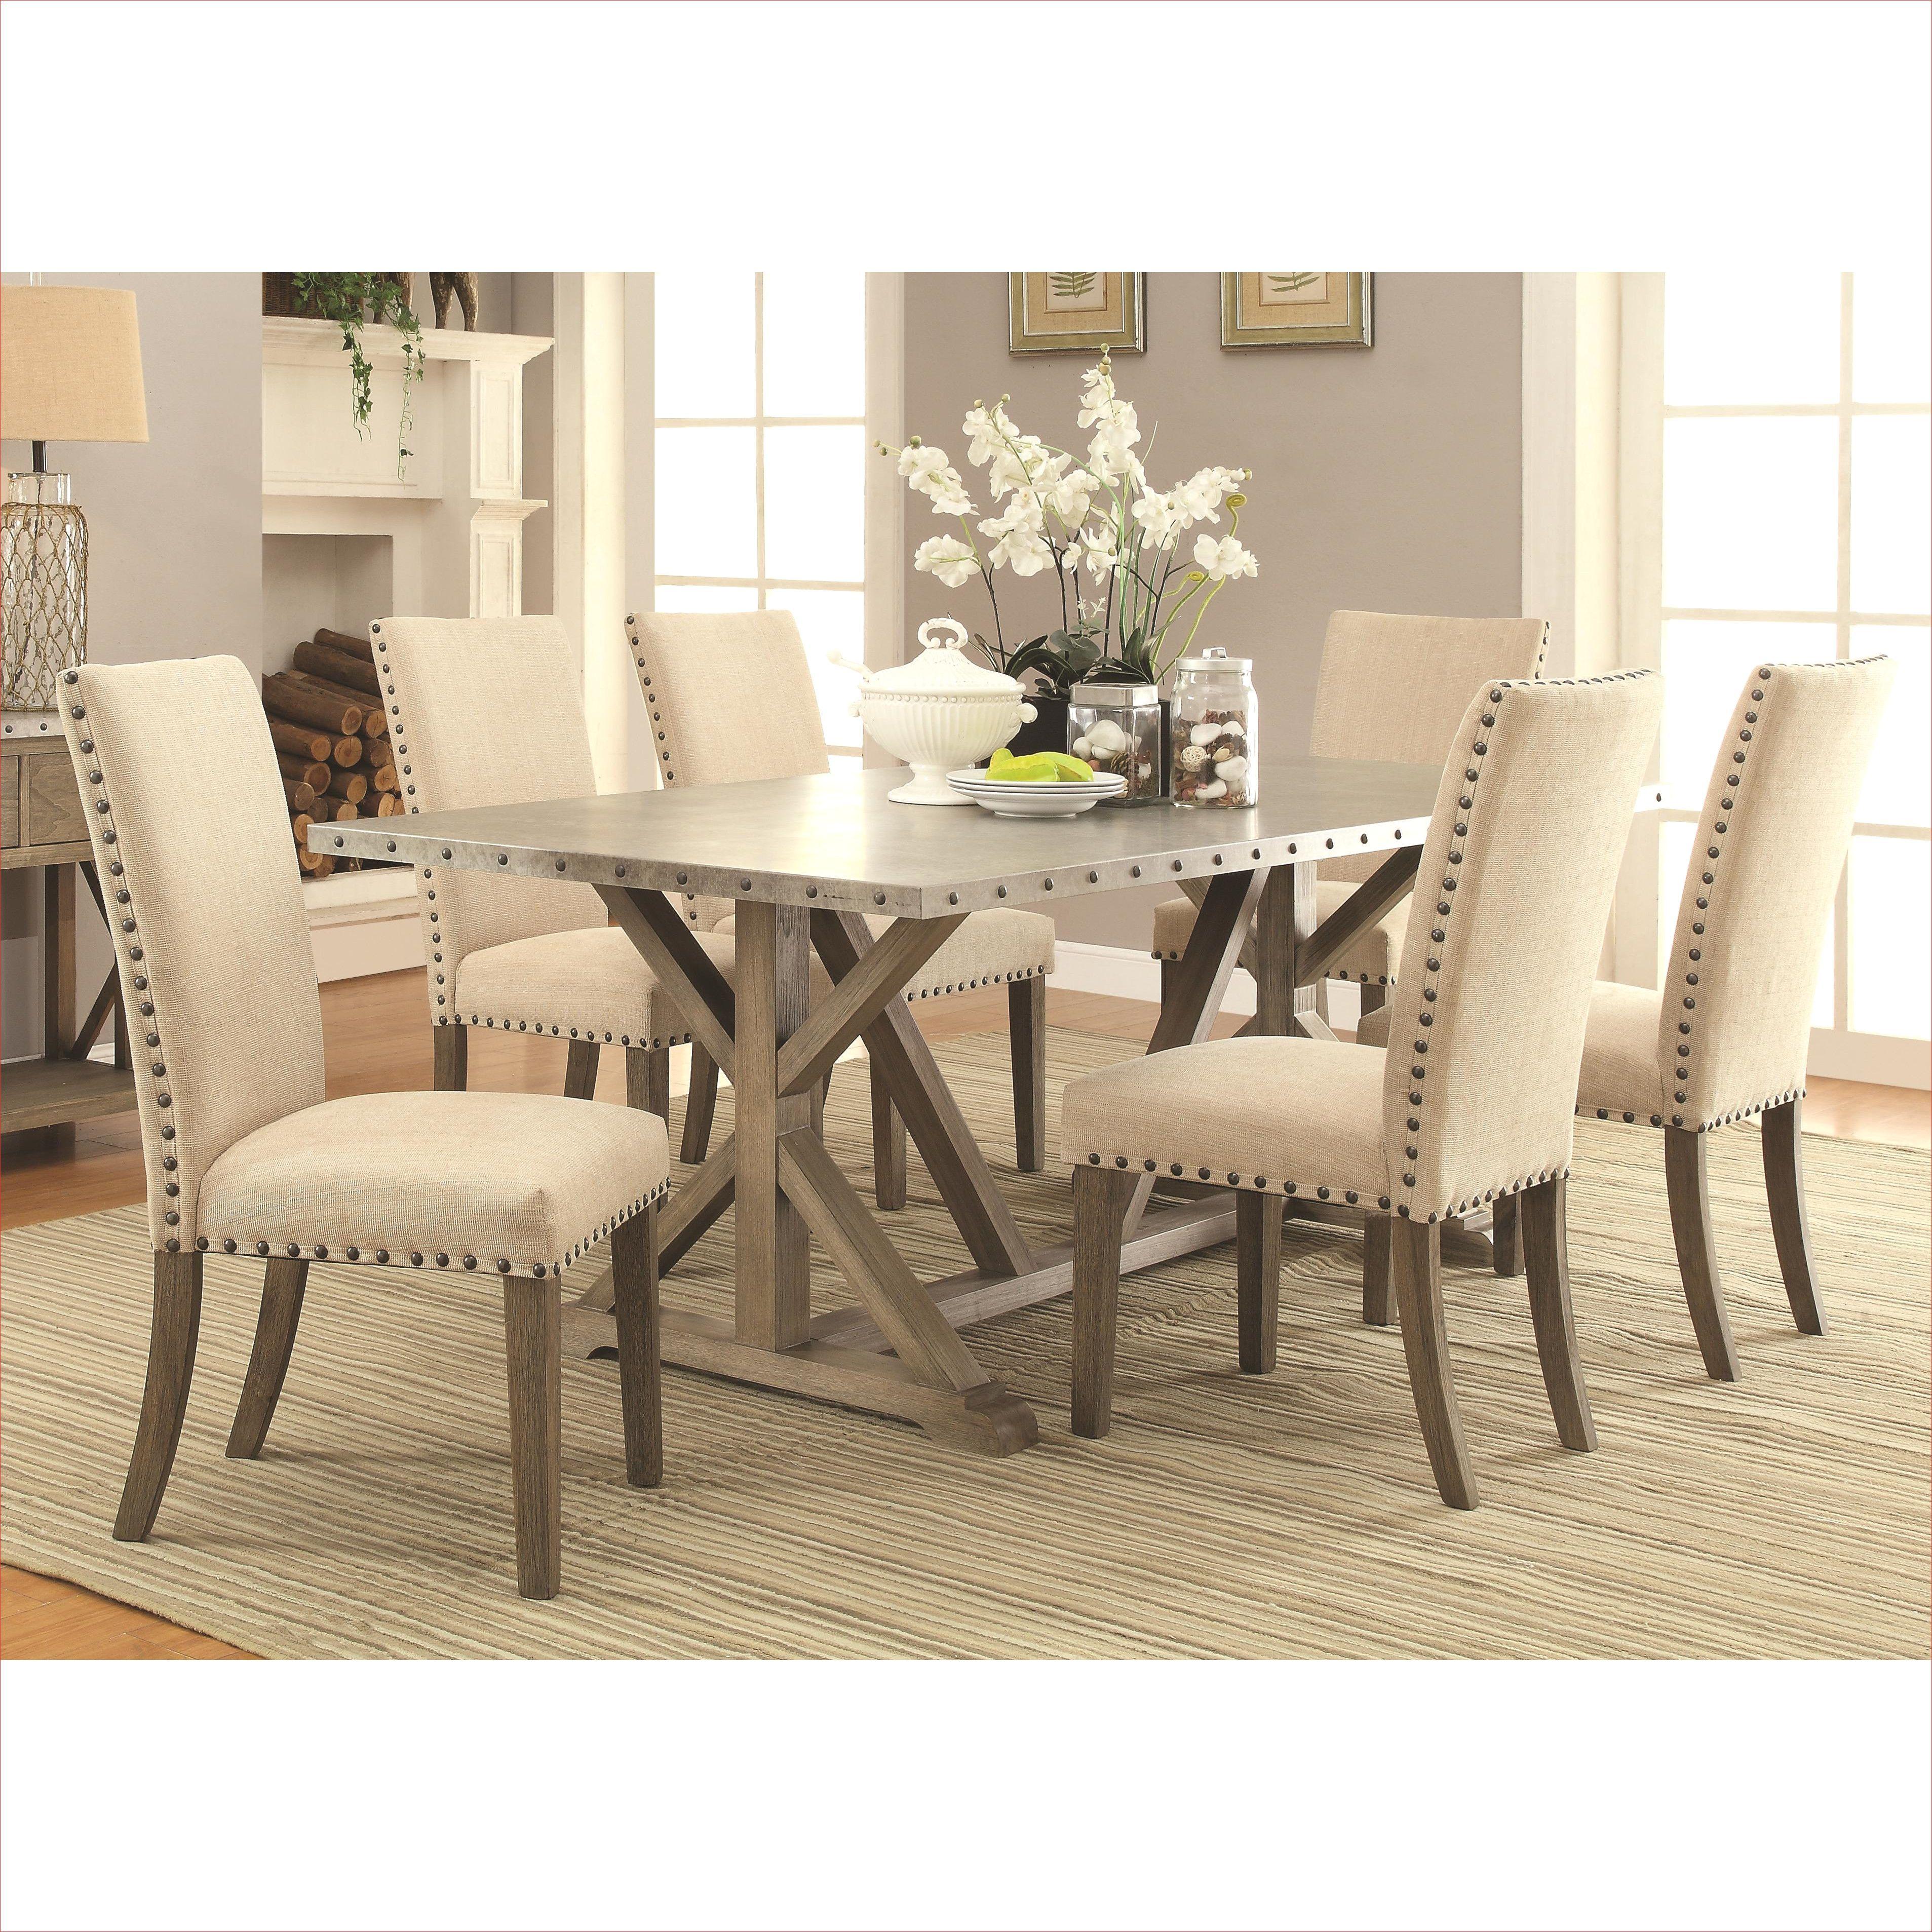 Wayfair Dining Room Sets Interior Design Table Beautiful Gallery ...